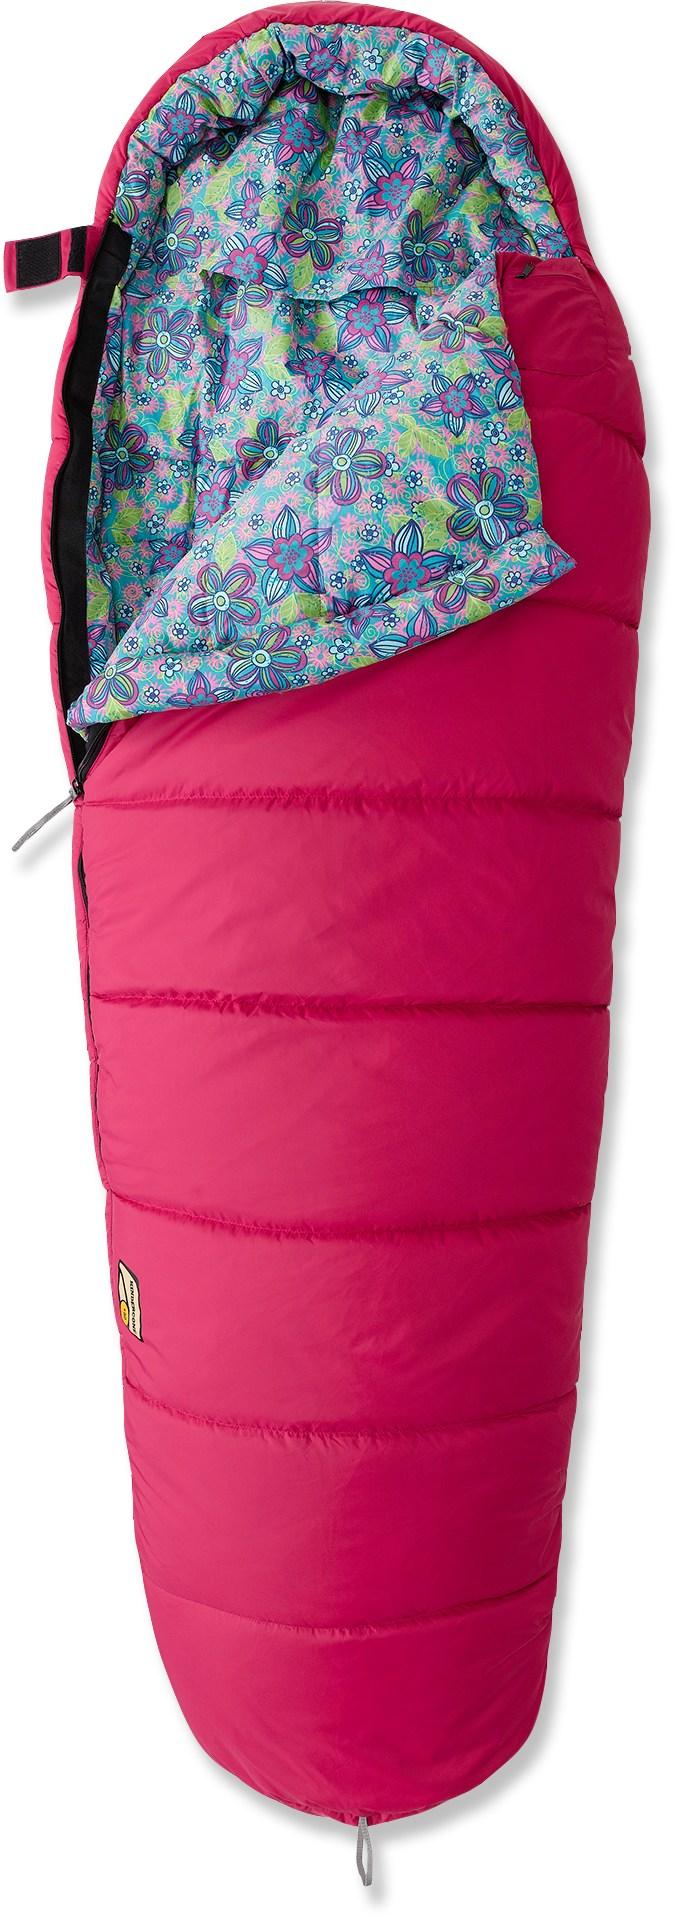 Kindercone 30+ sleeping bag